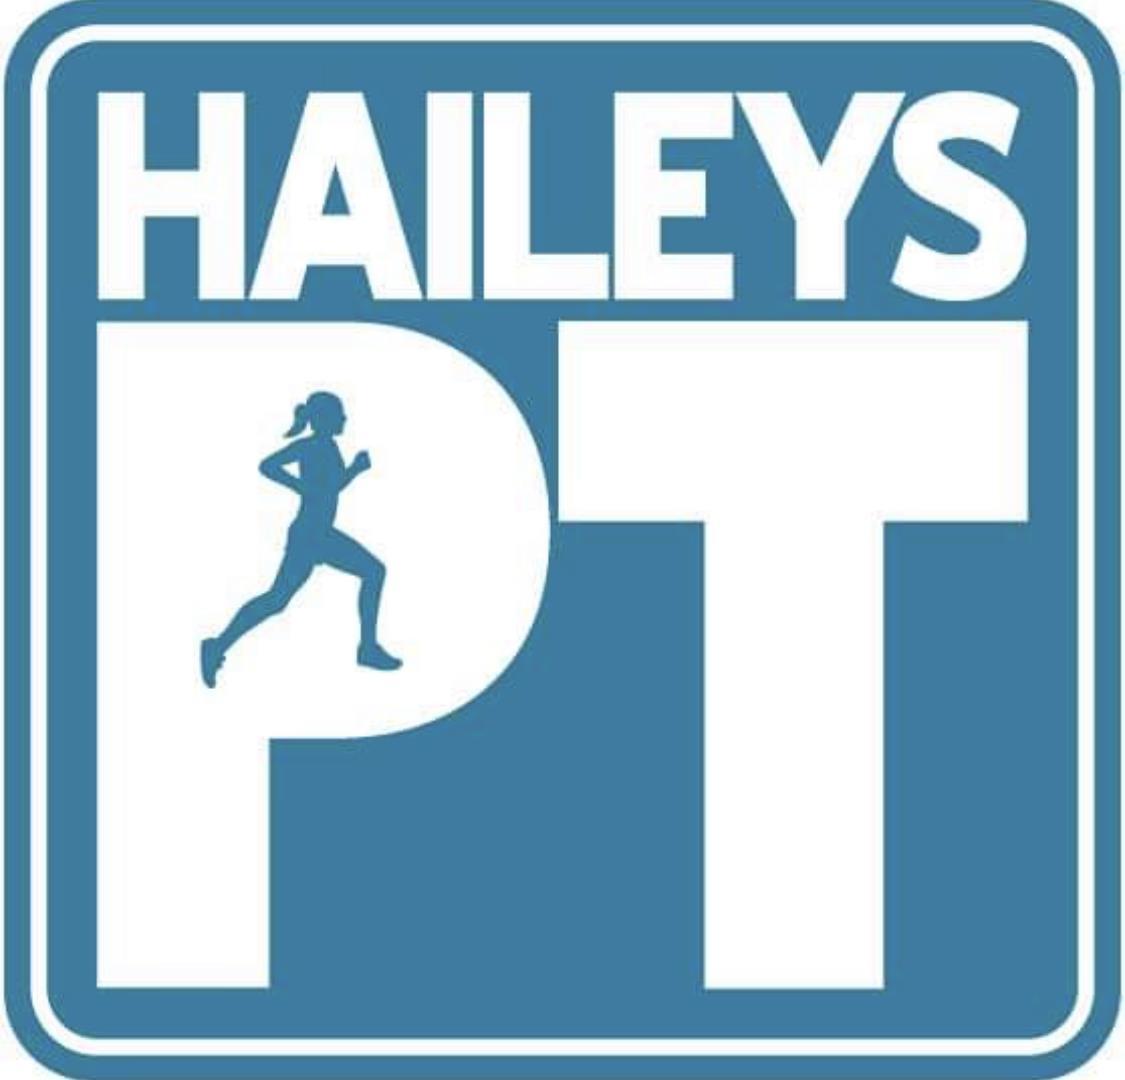 Haileys Personal Training